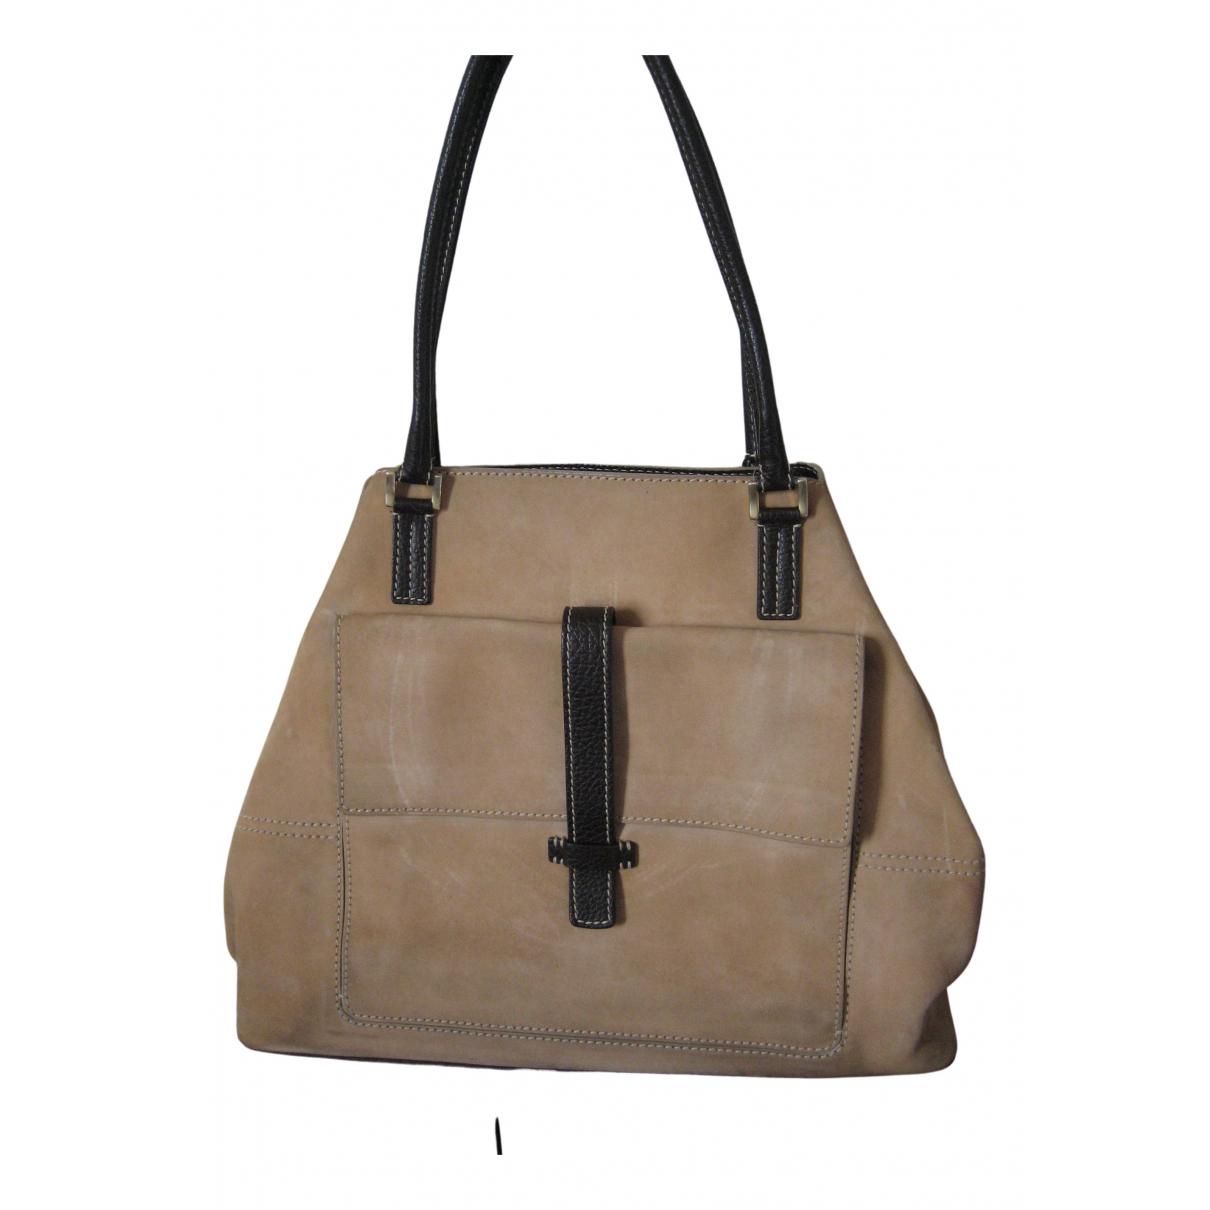 Loro Piana N Beige Suede handbag for Women N